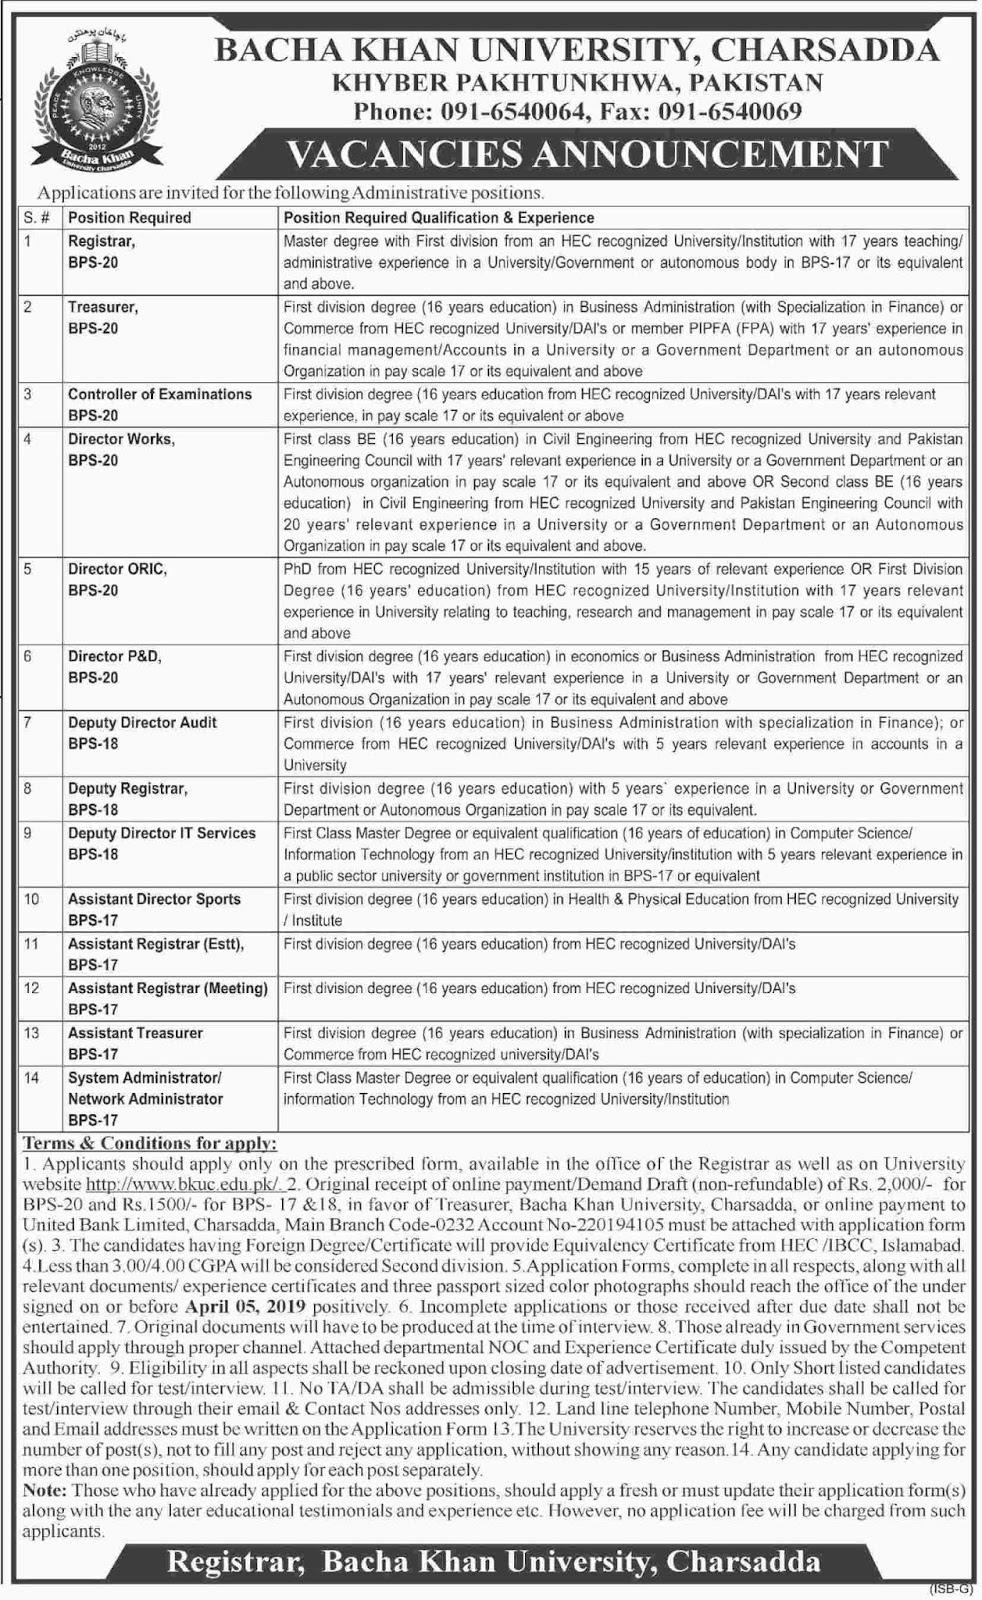 Bacha Khan University Charsadda 09 Mar 2019 Jobs